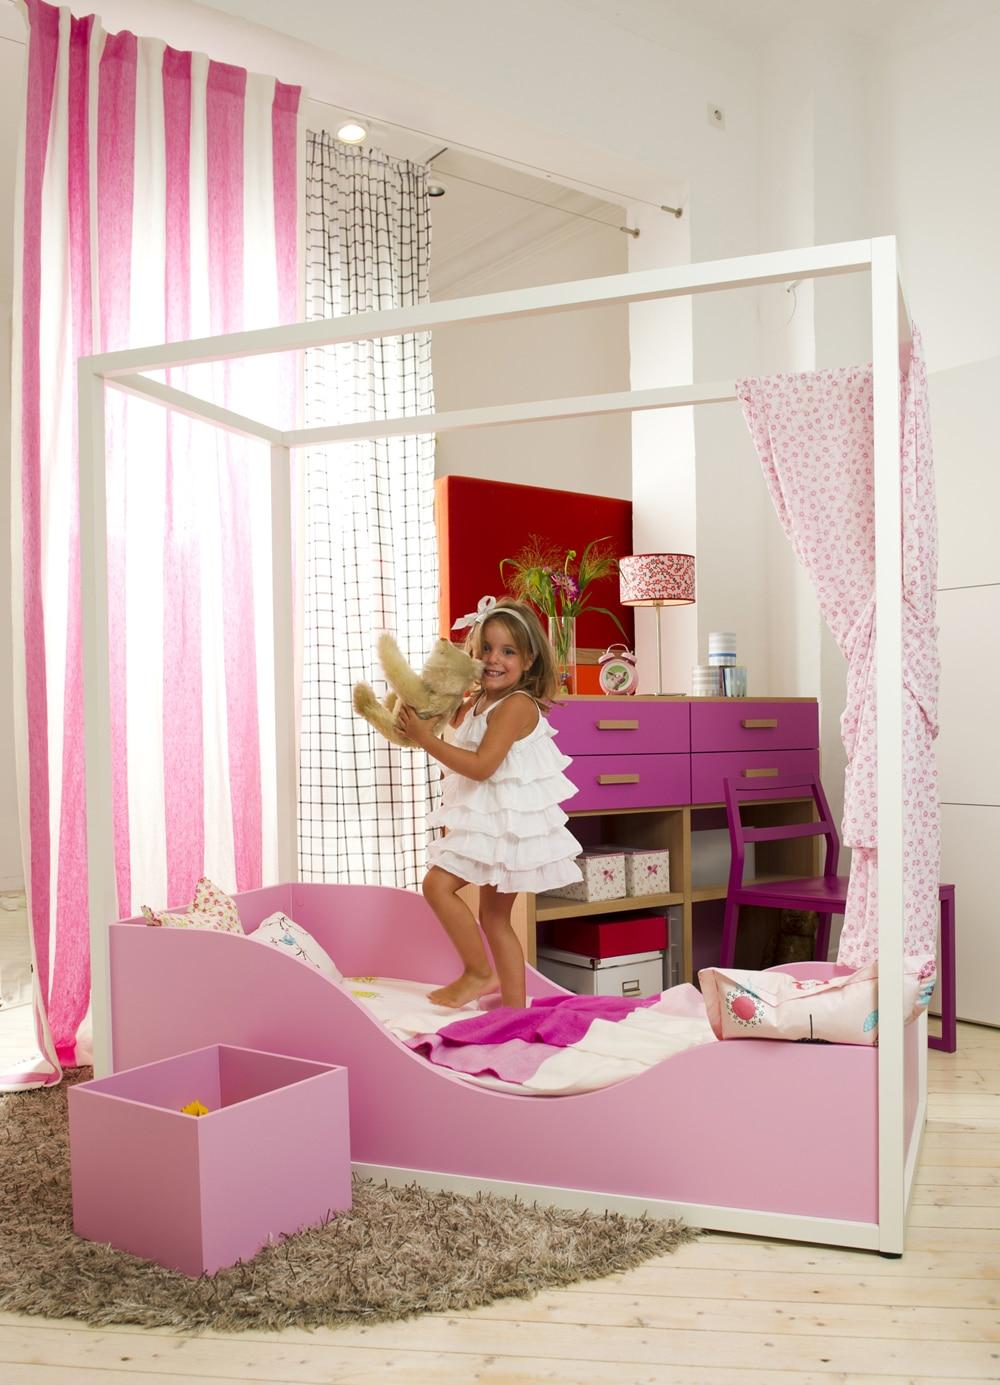 Kinderbett fr kleines zimmer affordable die besten for Kinderbett kleines zimmer